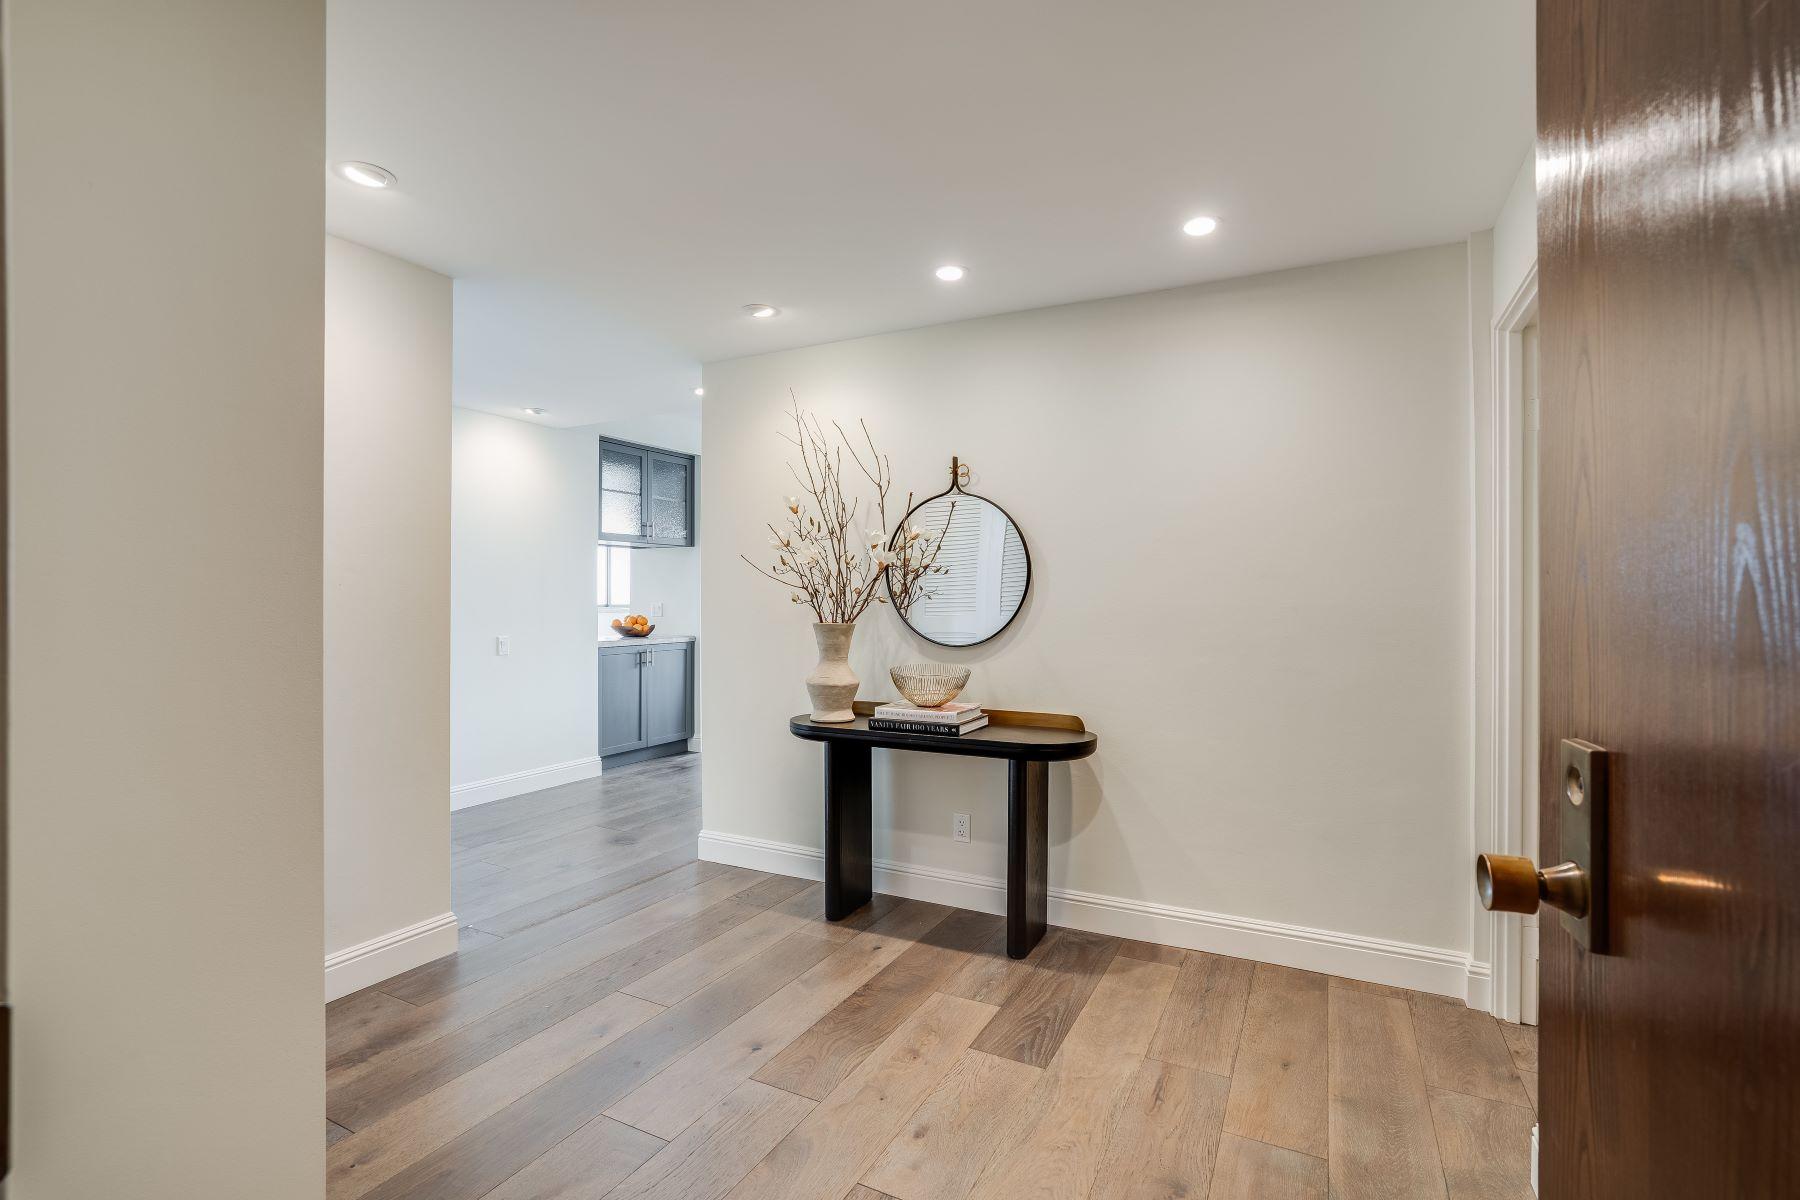 Condominiums 为 销售 在 Luxury Condo in San Mateo Park! 50 Mounds Road #206 圣马特奥市, 加利福尼亚州 94402 美国